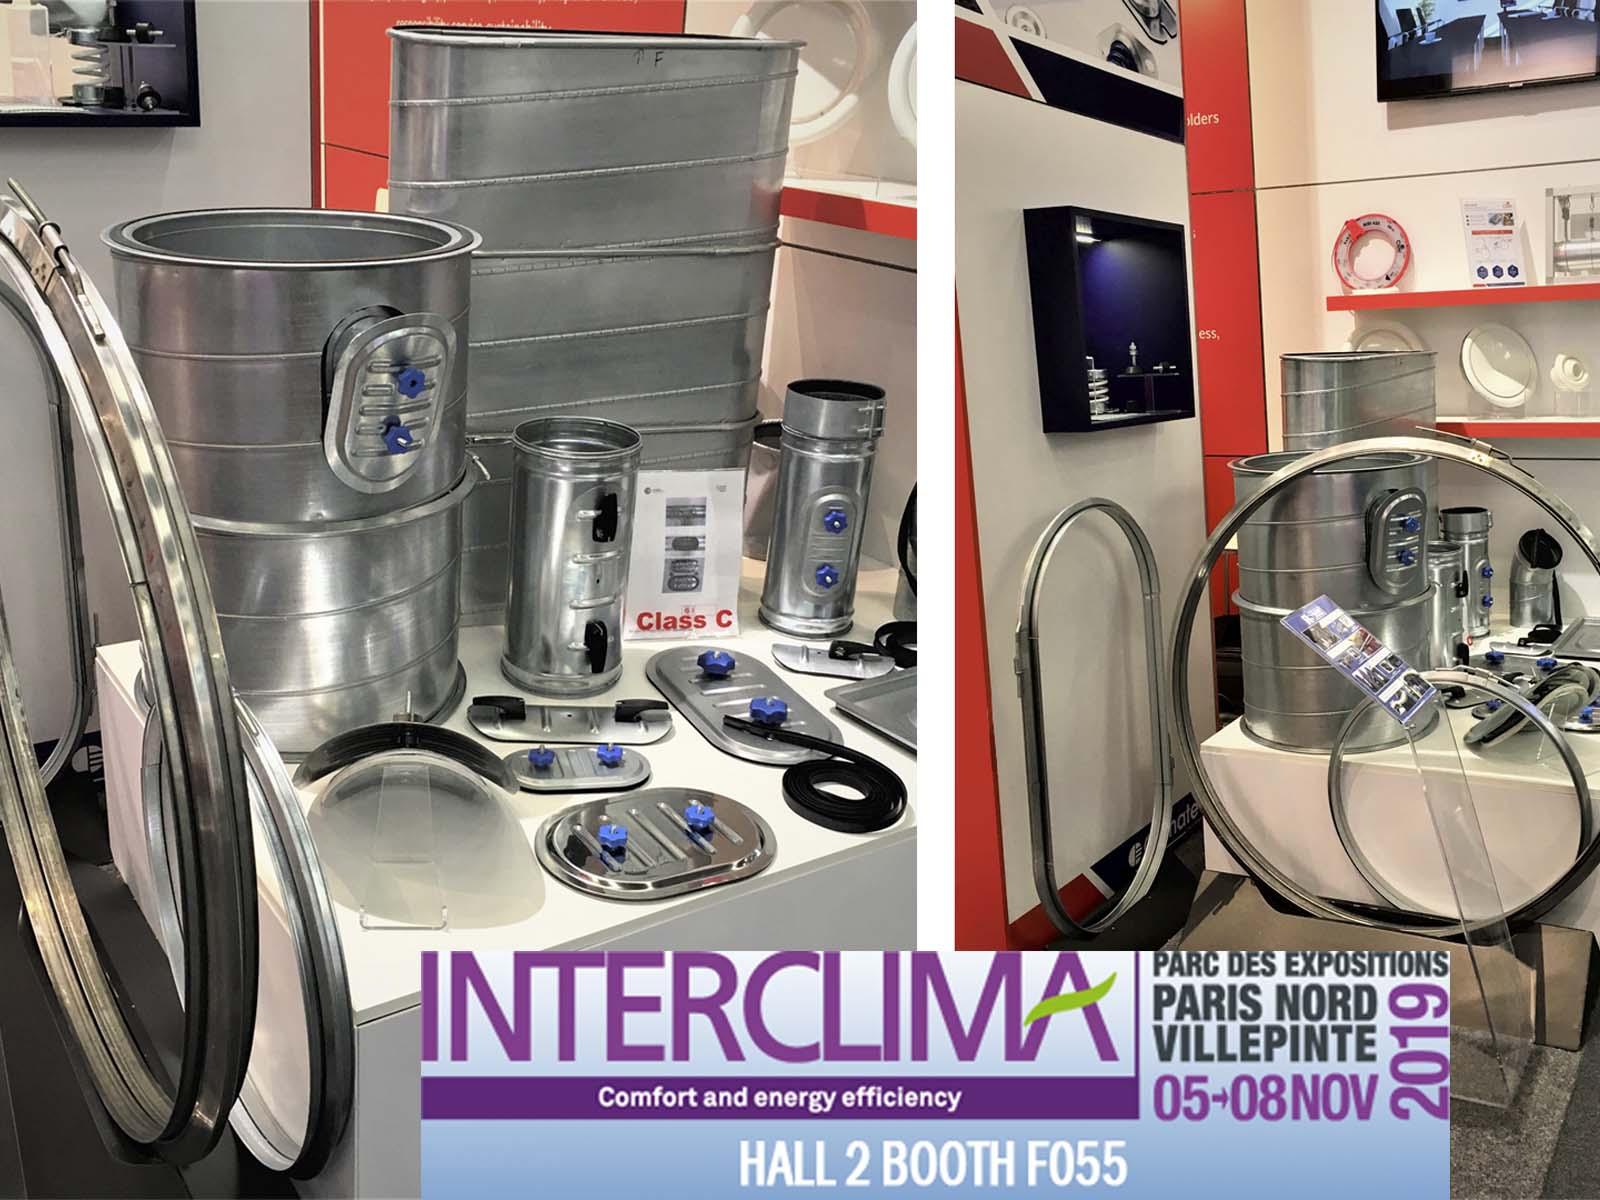 foto interclima 2019-2